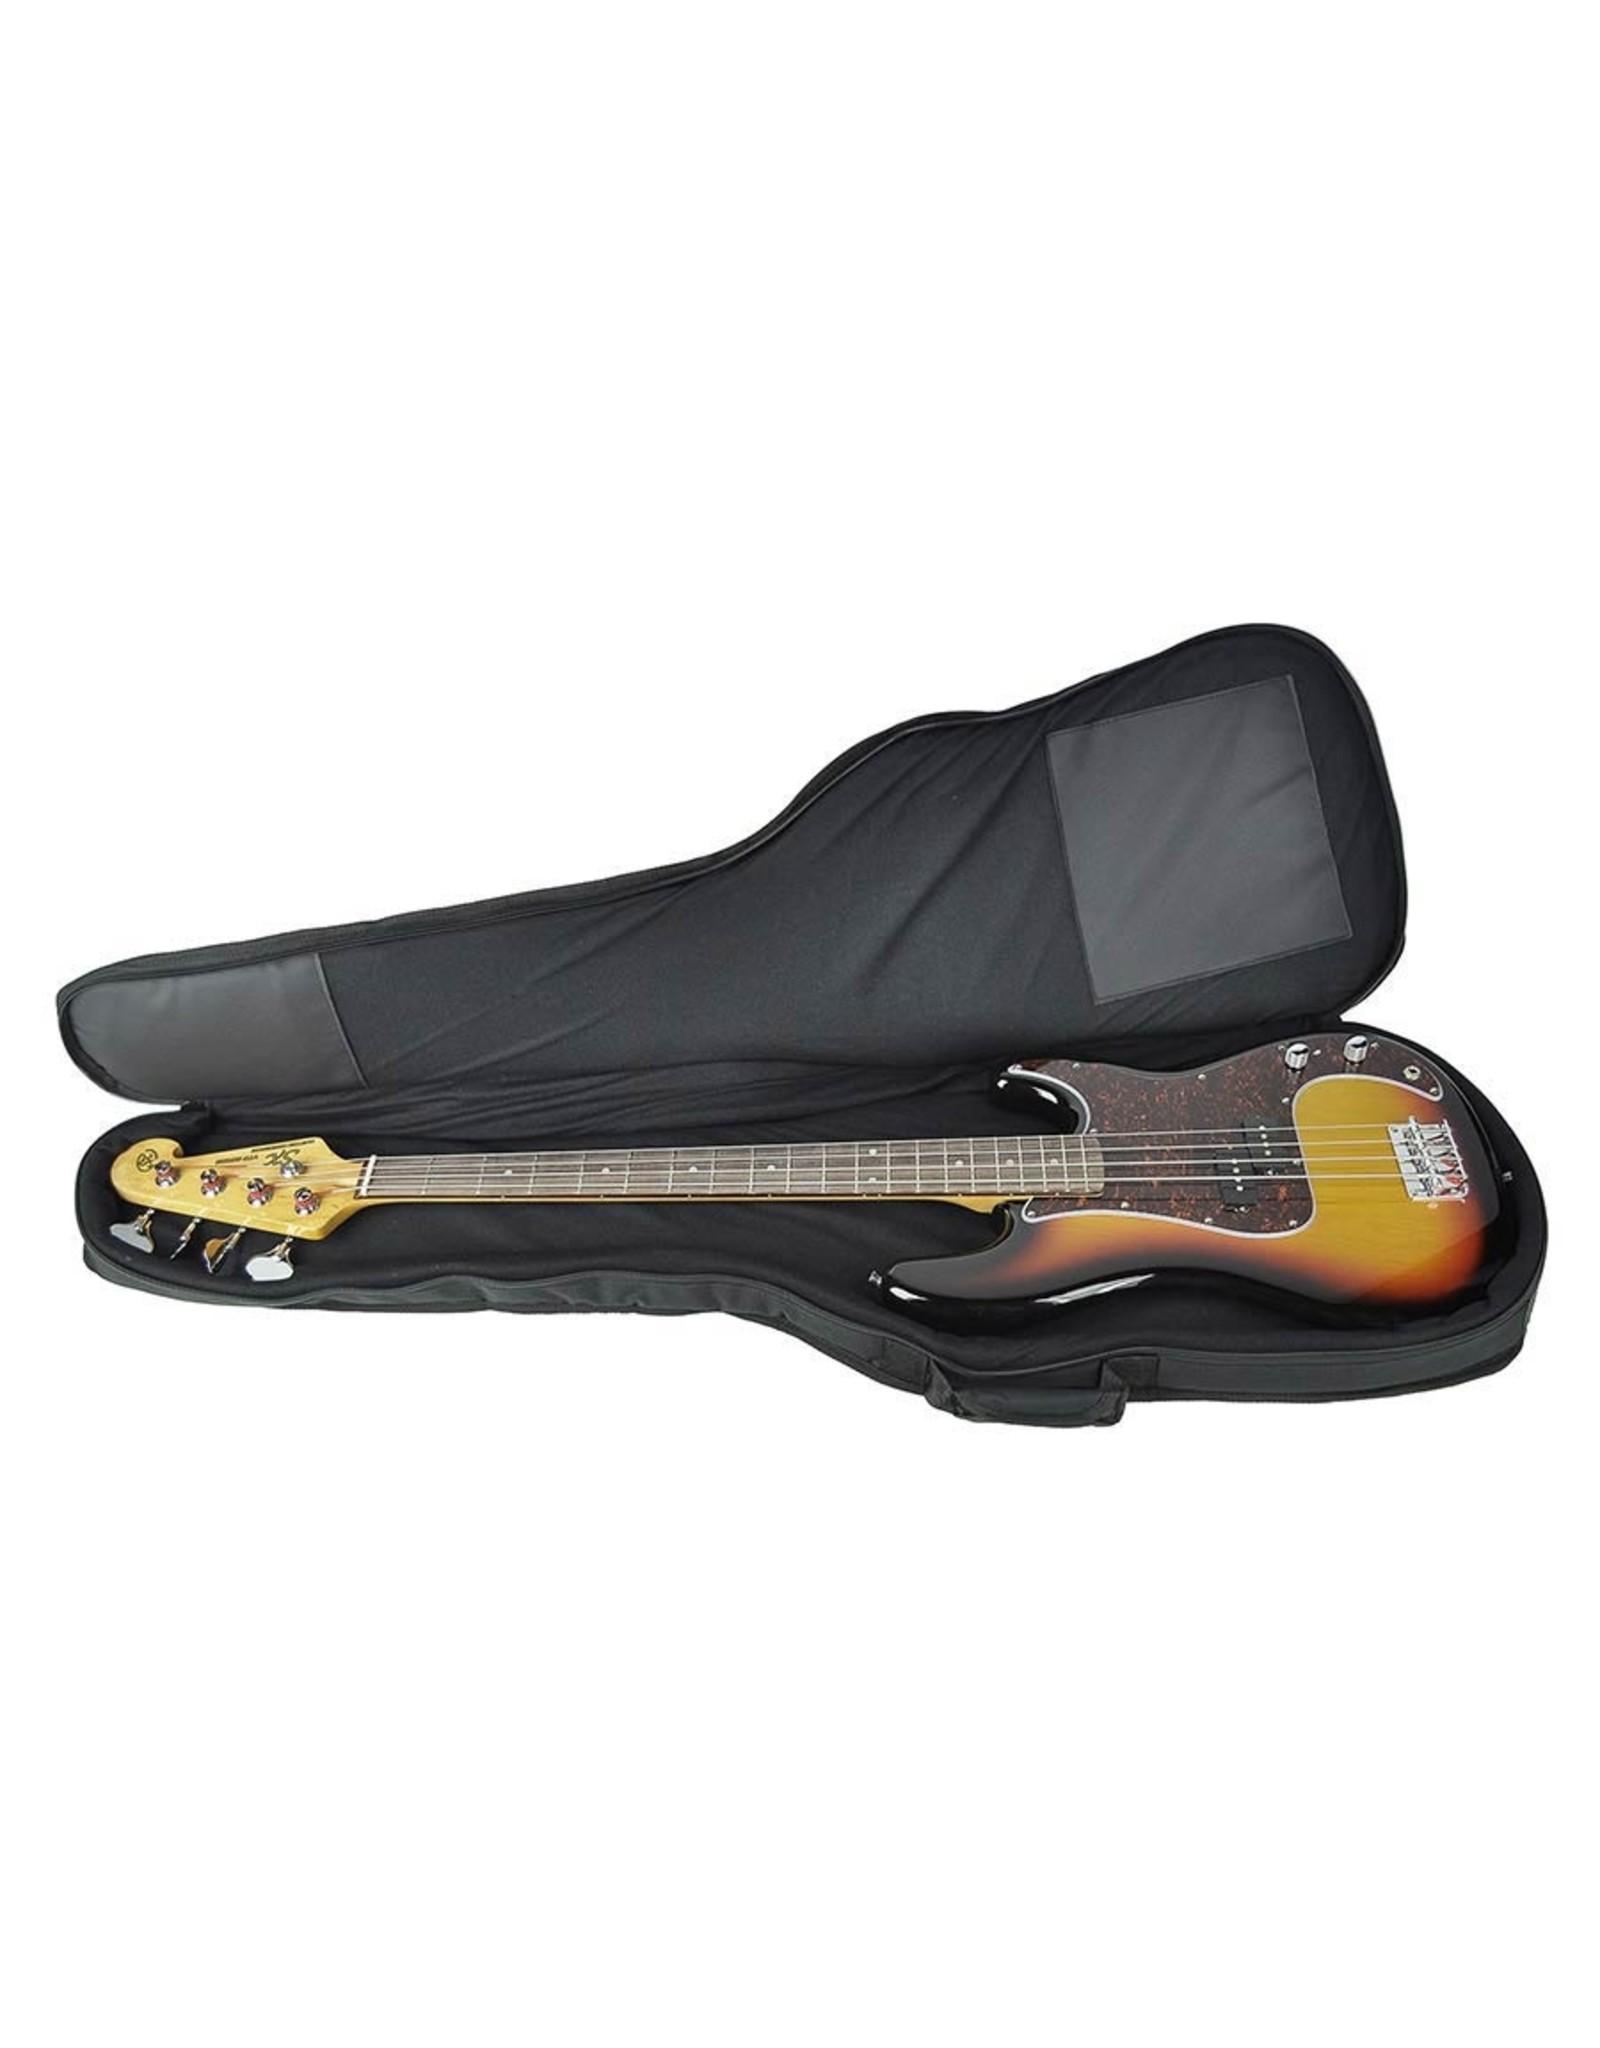 Boston Boston B-15-BG Bass guitar bag